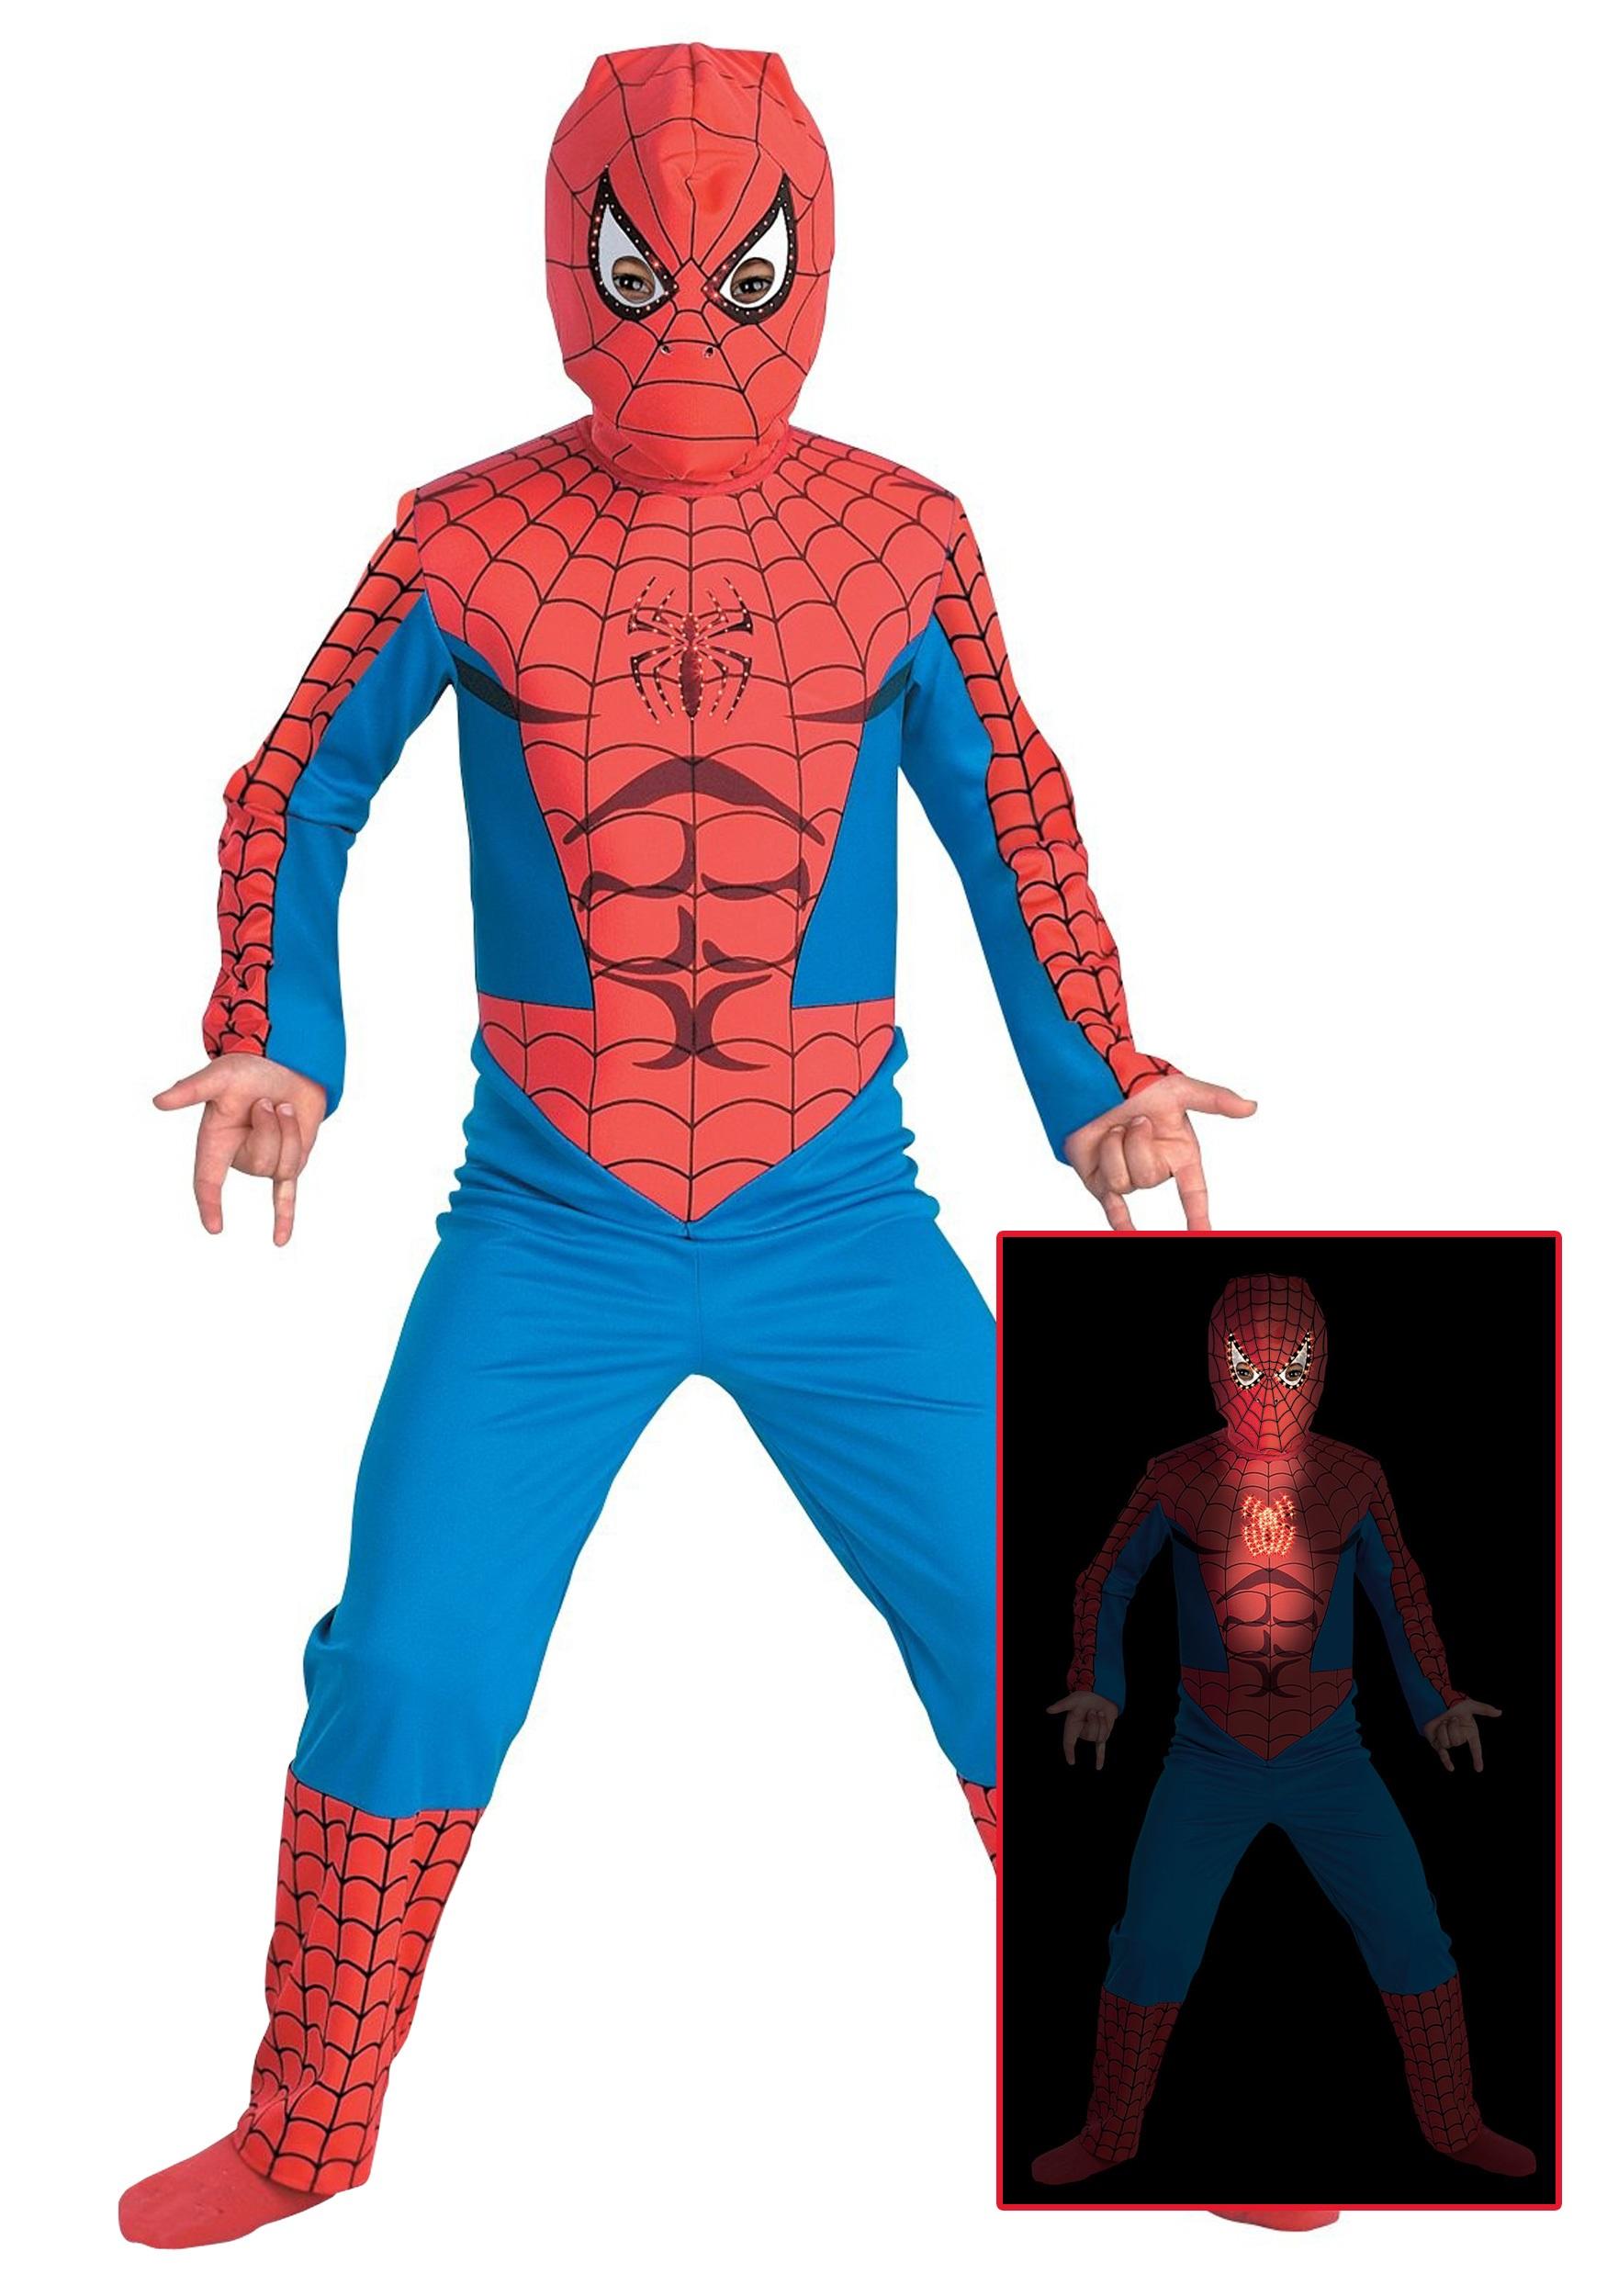 Fiber Optic Child Spiderman Costume  sc 1 st  Halloween Costumes & Fiber Optic Child Spiderman Costume - Halloween Costumes